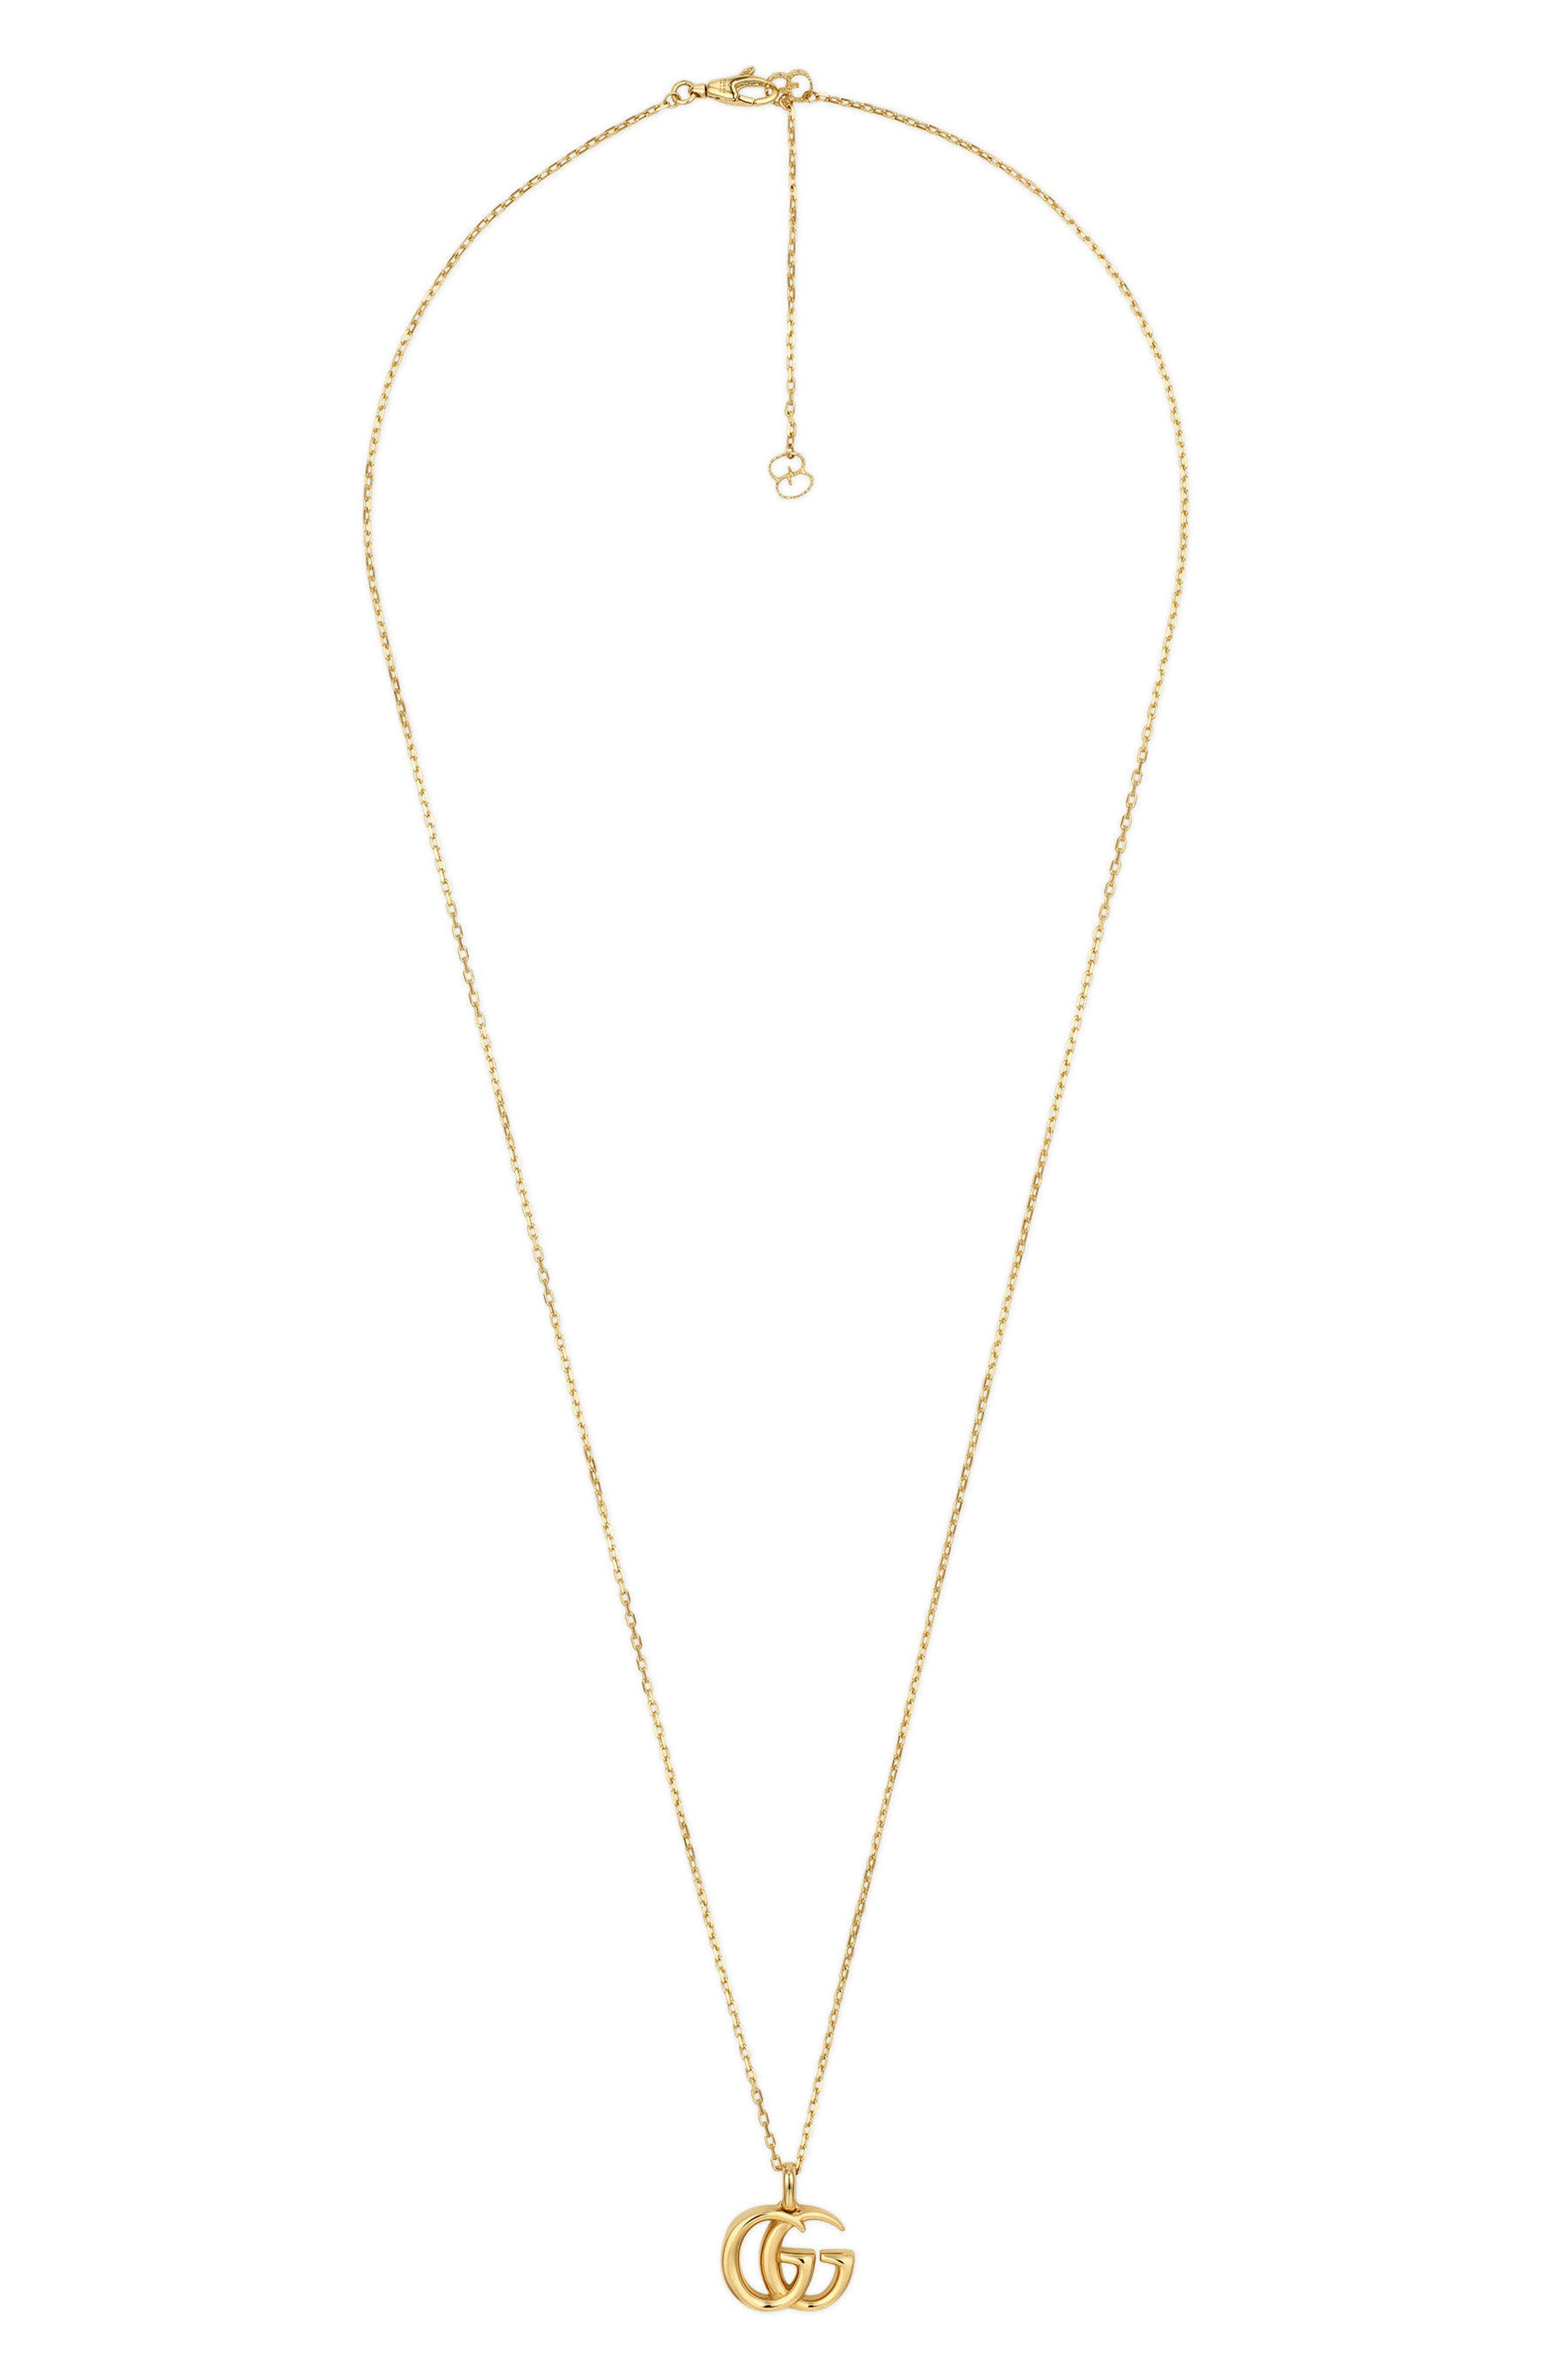 Double-G Pendant Necklace,                             Main thumbnail 1, color,                             Yellow Gold